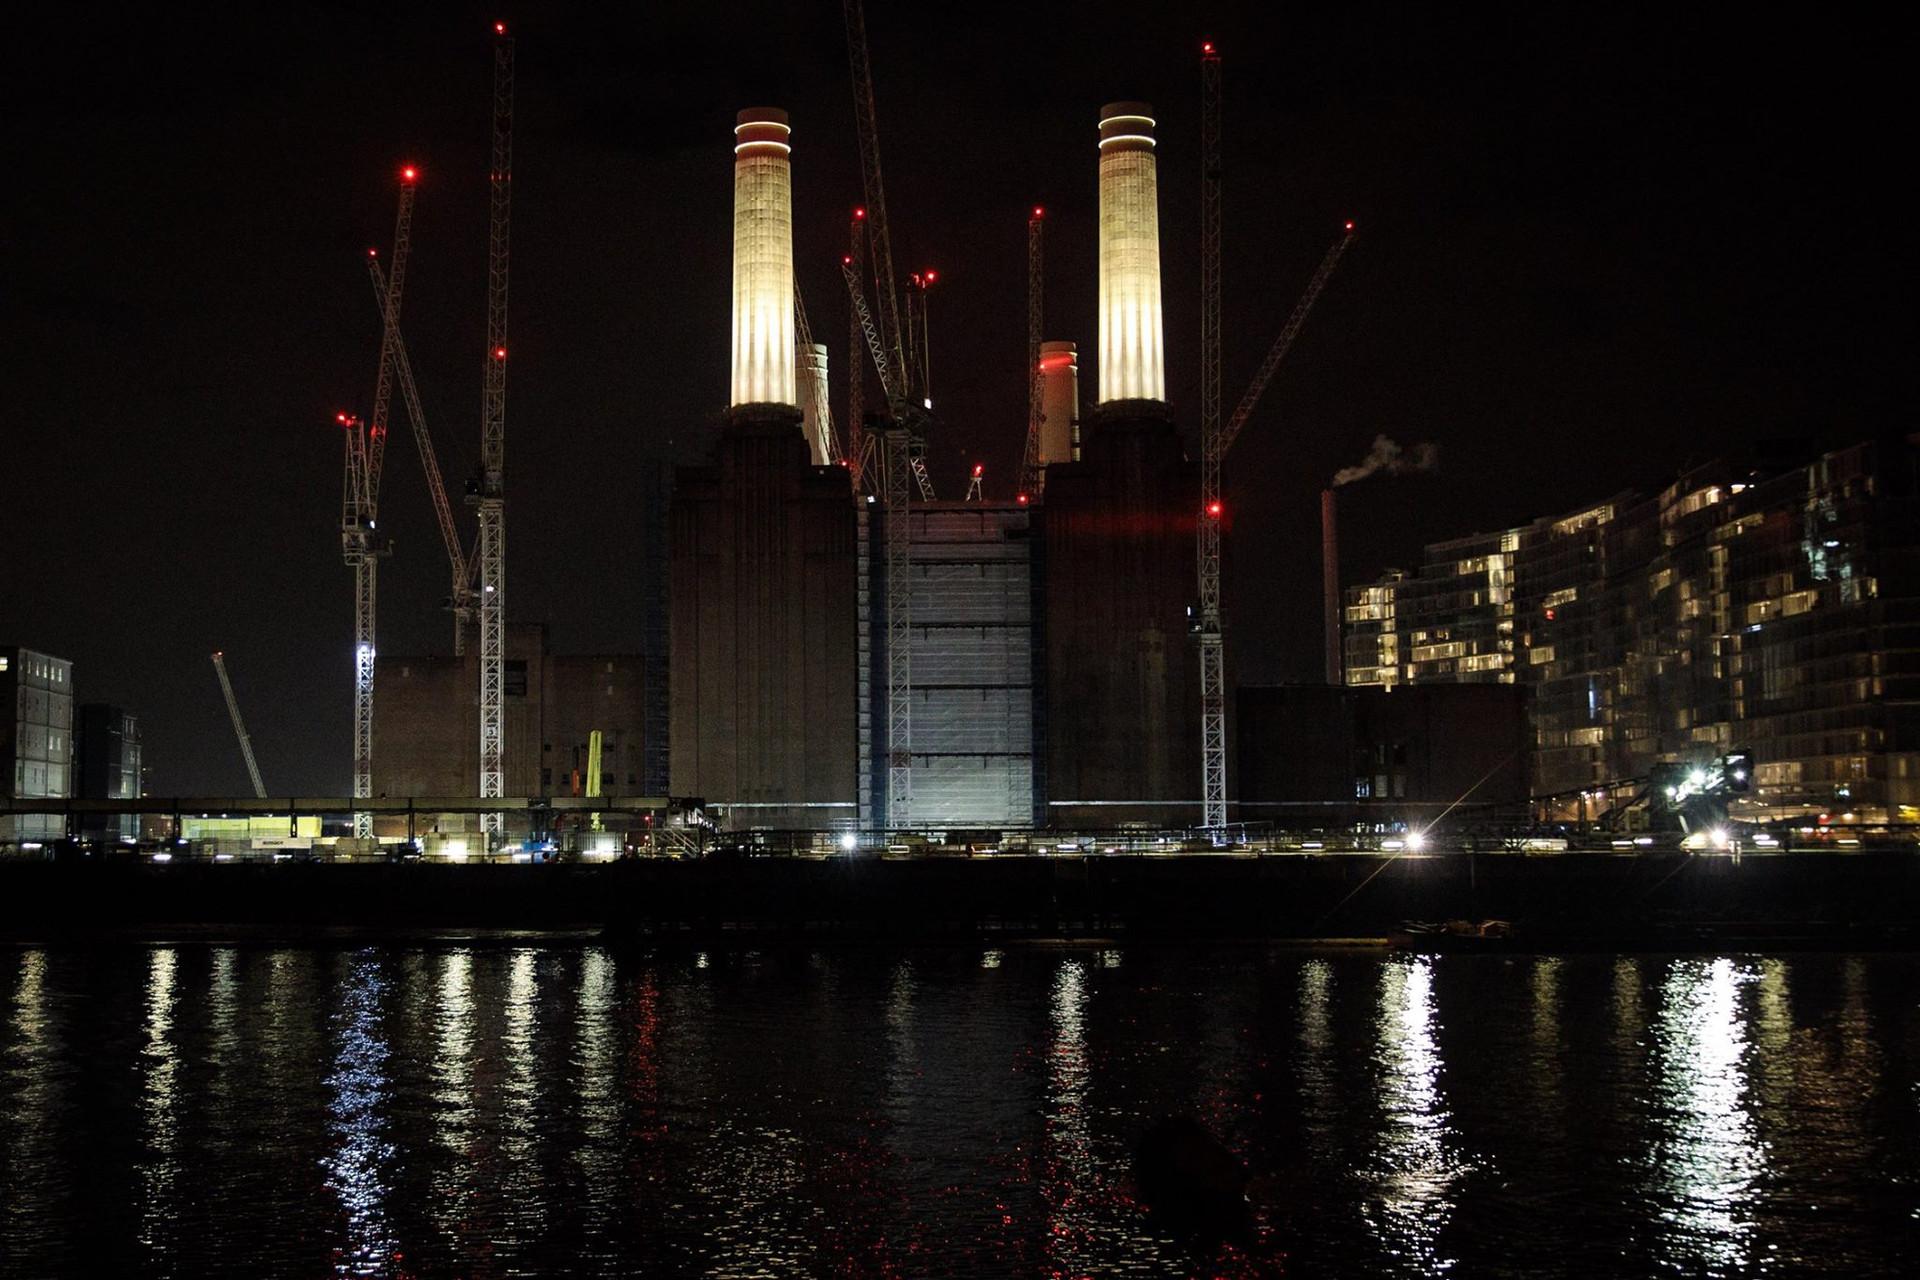 BATTERSEA CHIMNEYS - LONDON